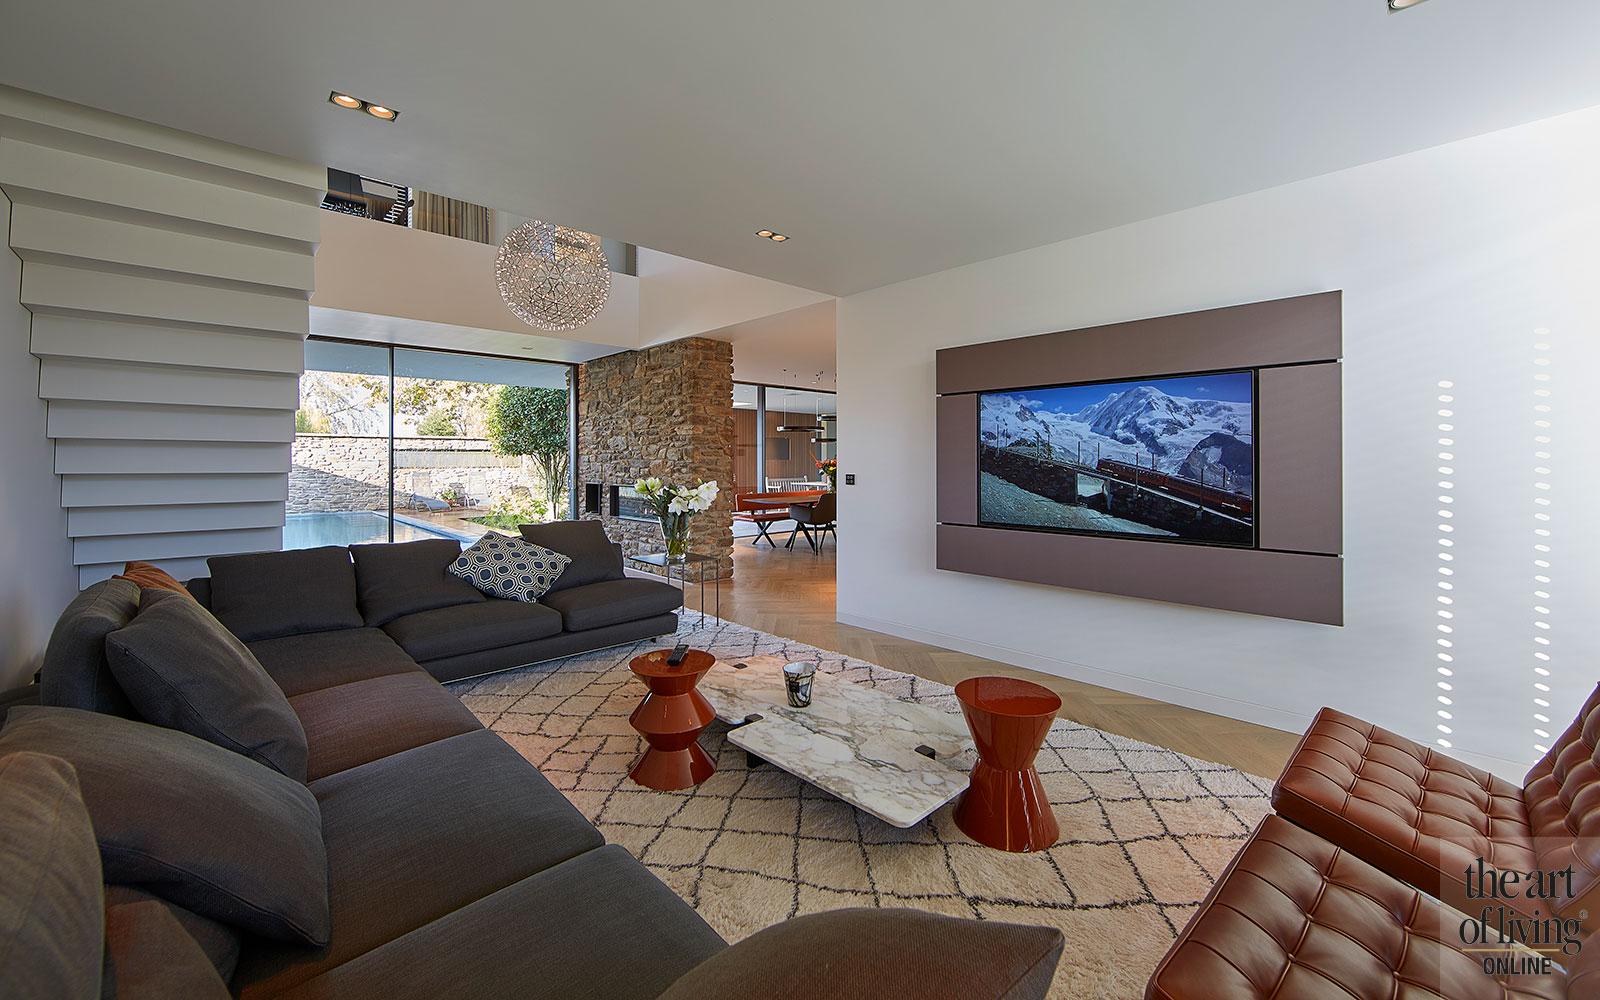 Design interieur, modern, landelijk